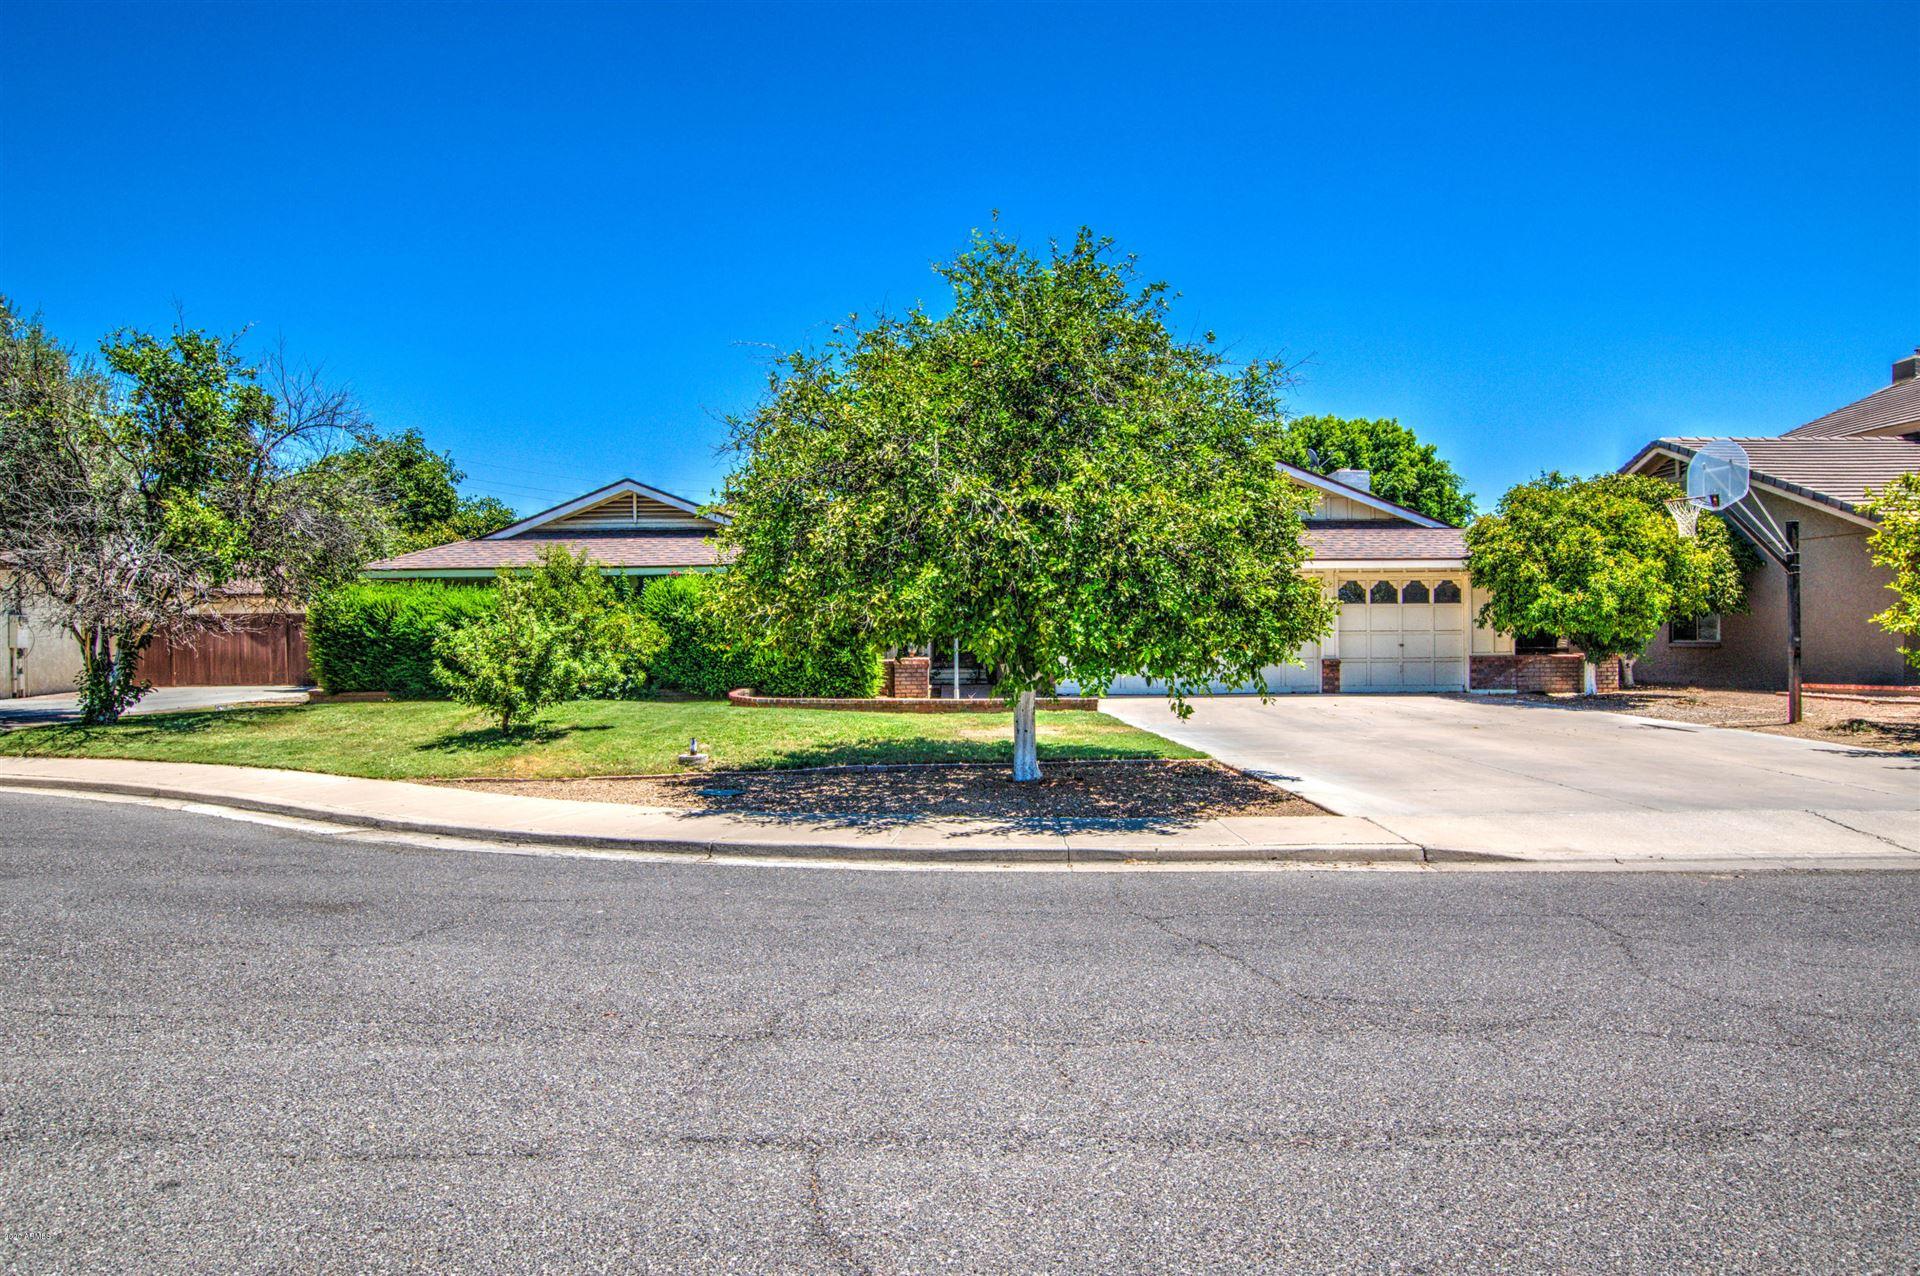 Property Image Of 1139 N York Circle In Mesa, Az